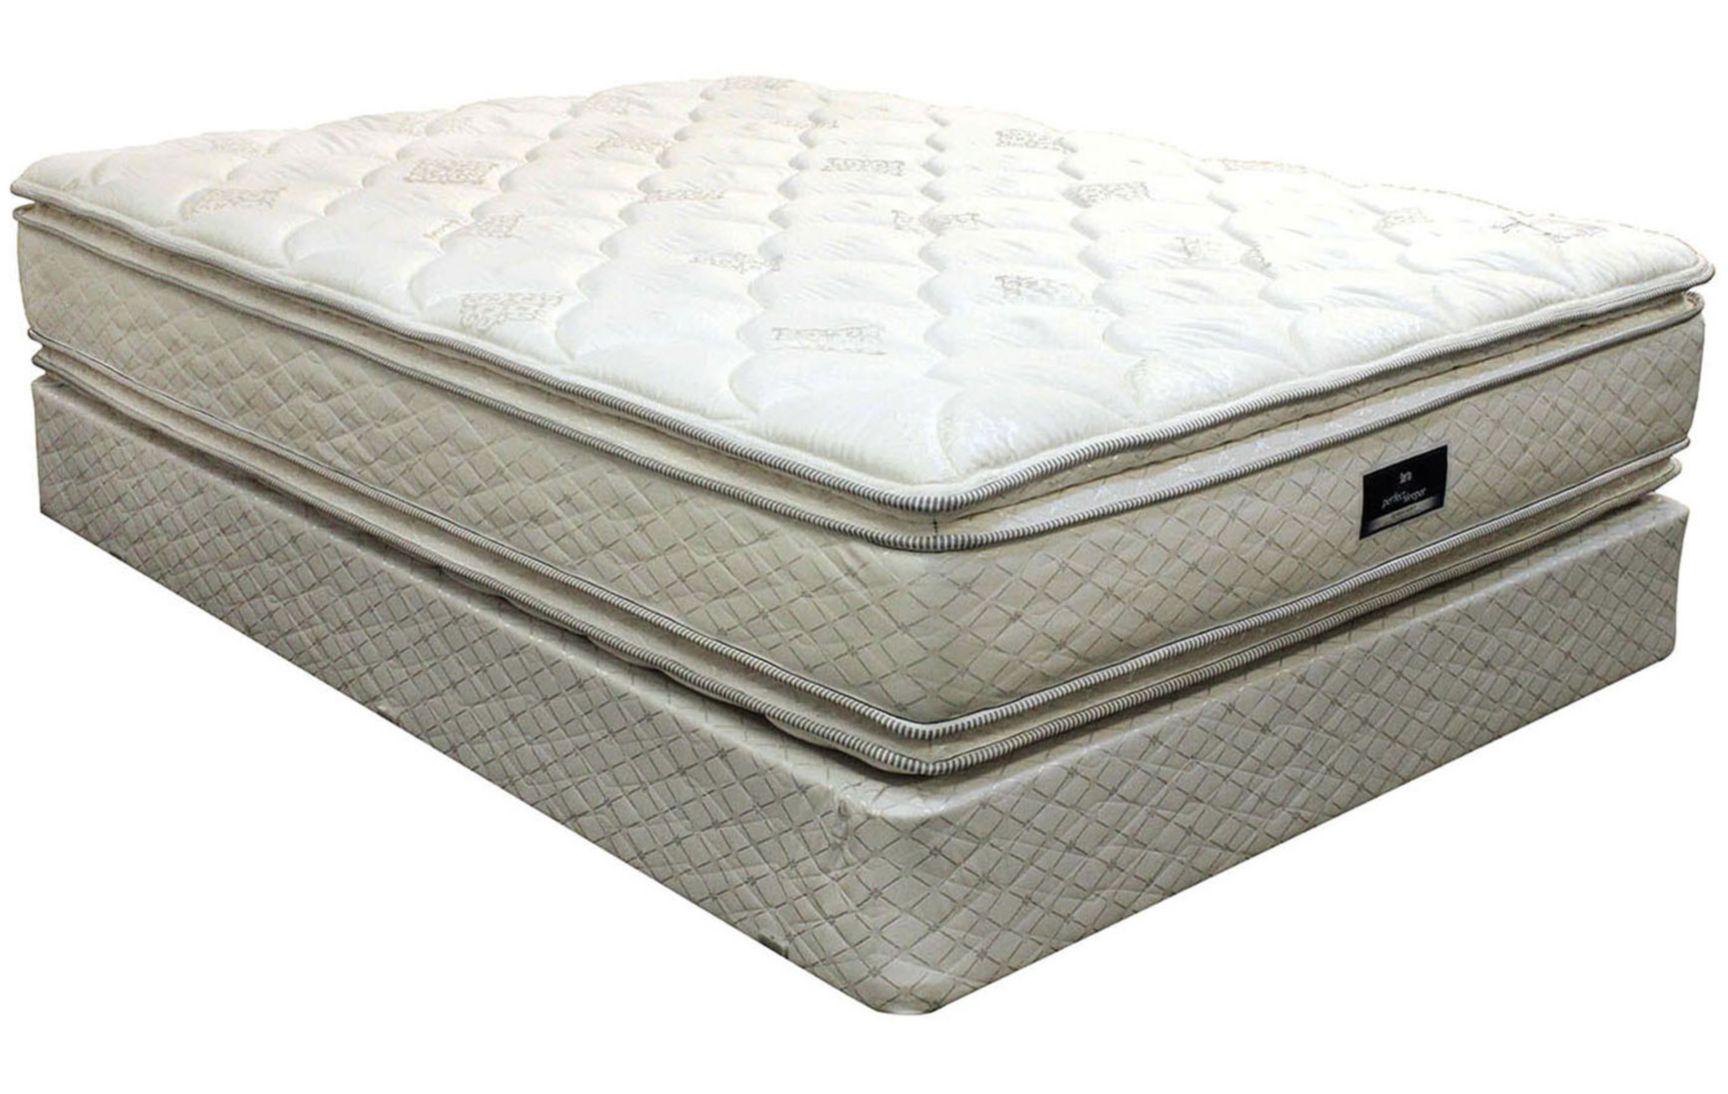 serta dreamhaven perfect sleeper hotel signature suite ii pillowtop